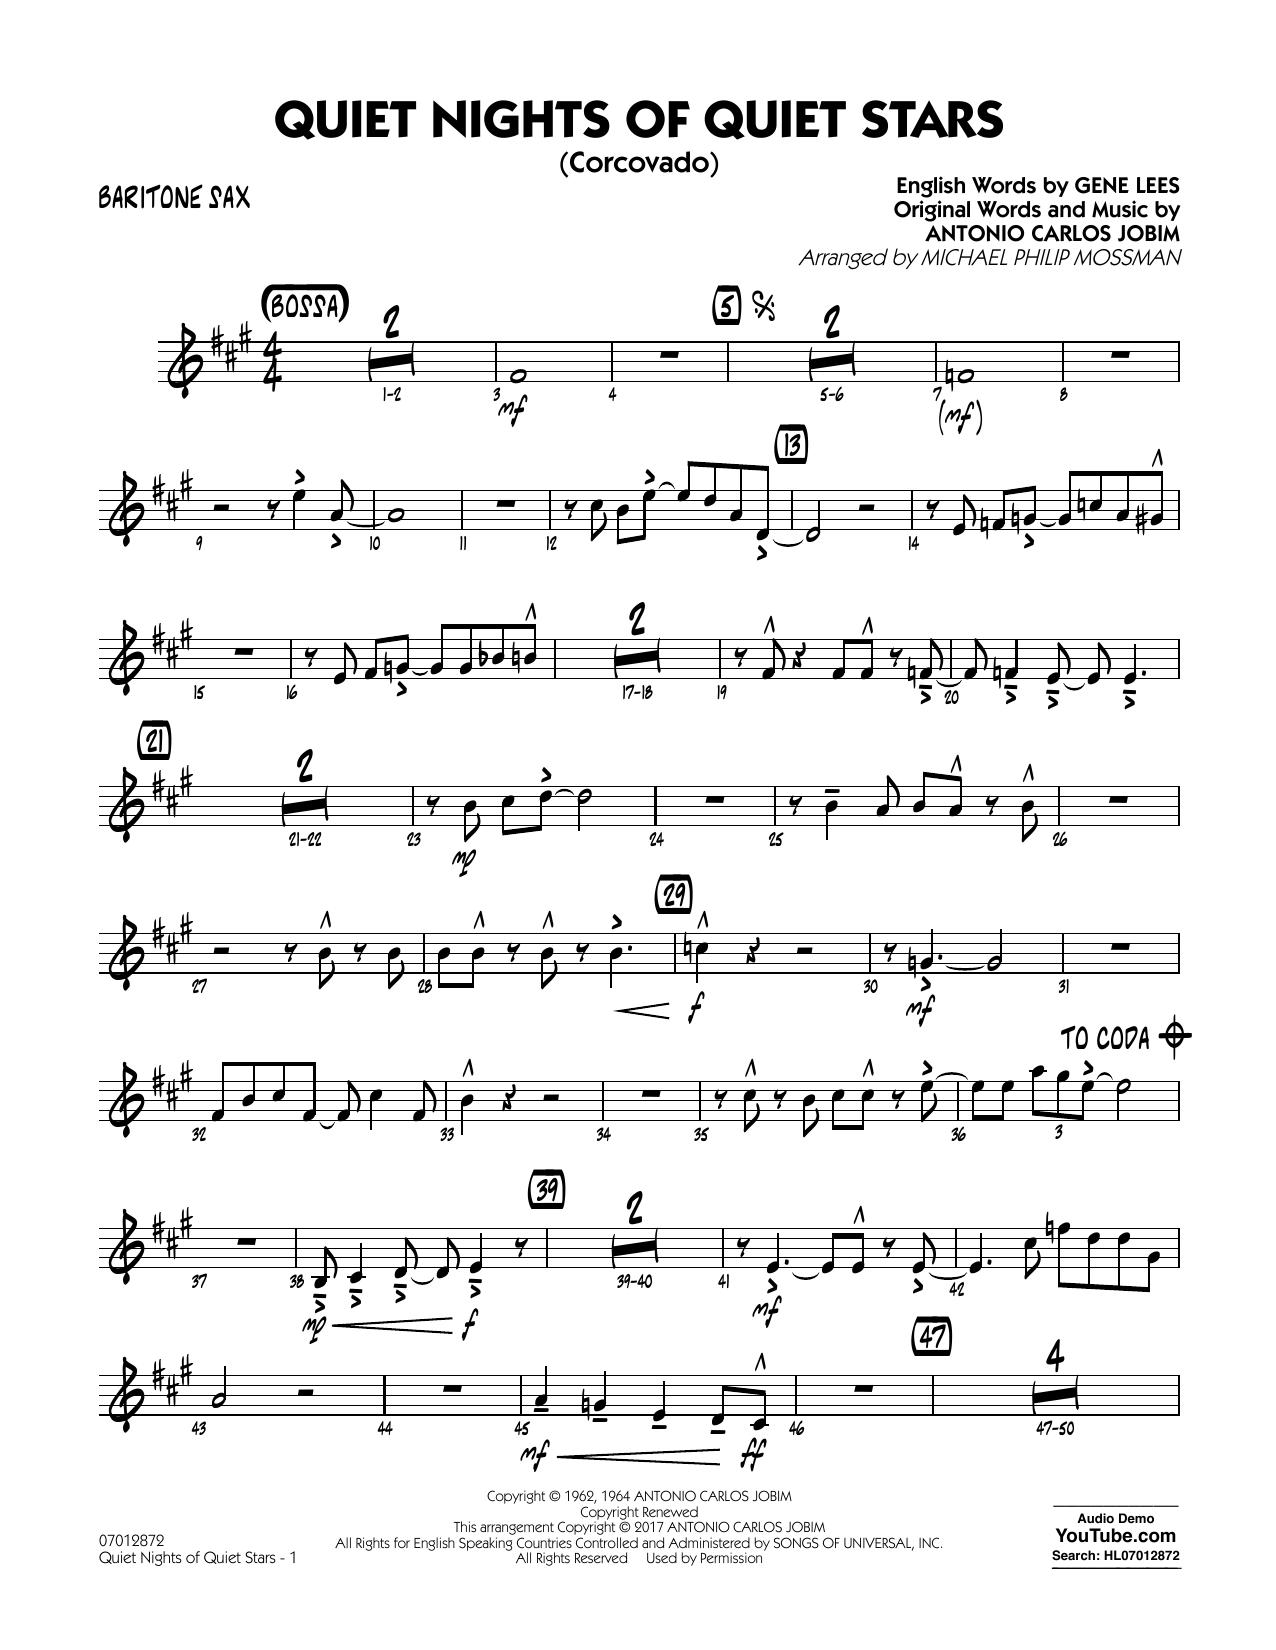 Quiet Nights of Quiet Stars (Corcovado) - Baritone Sax Sheet Music